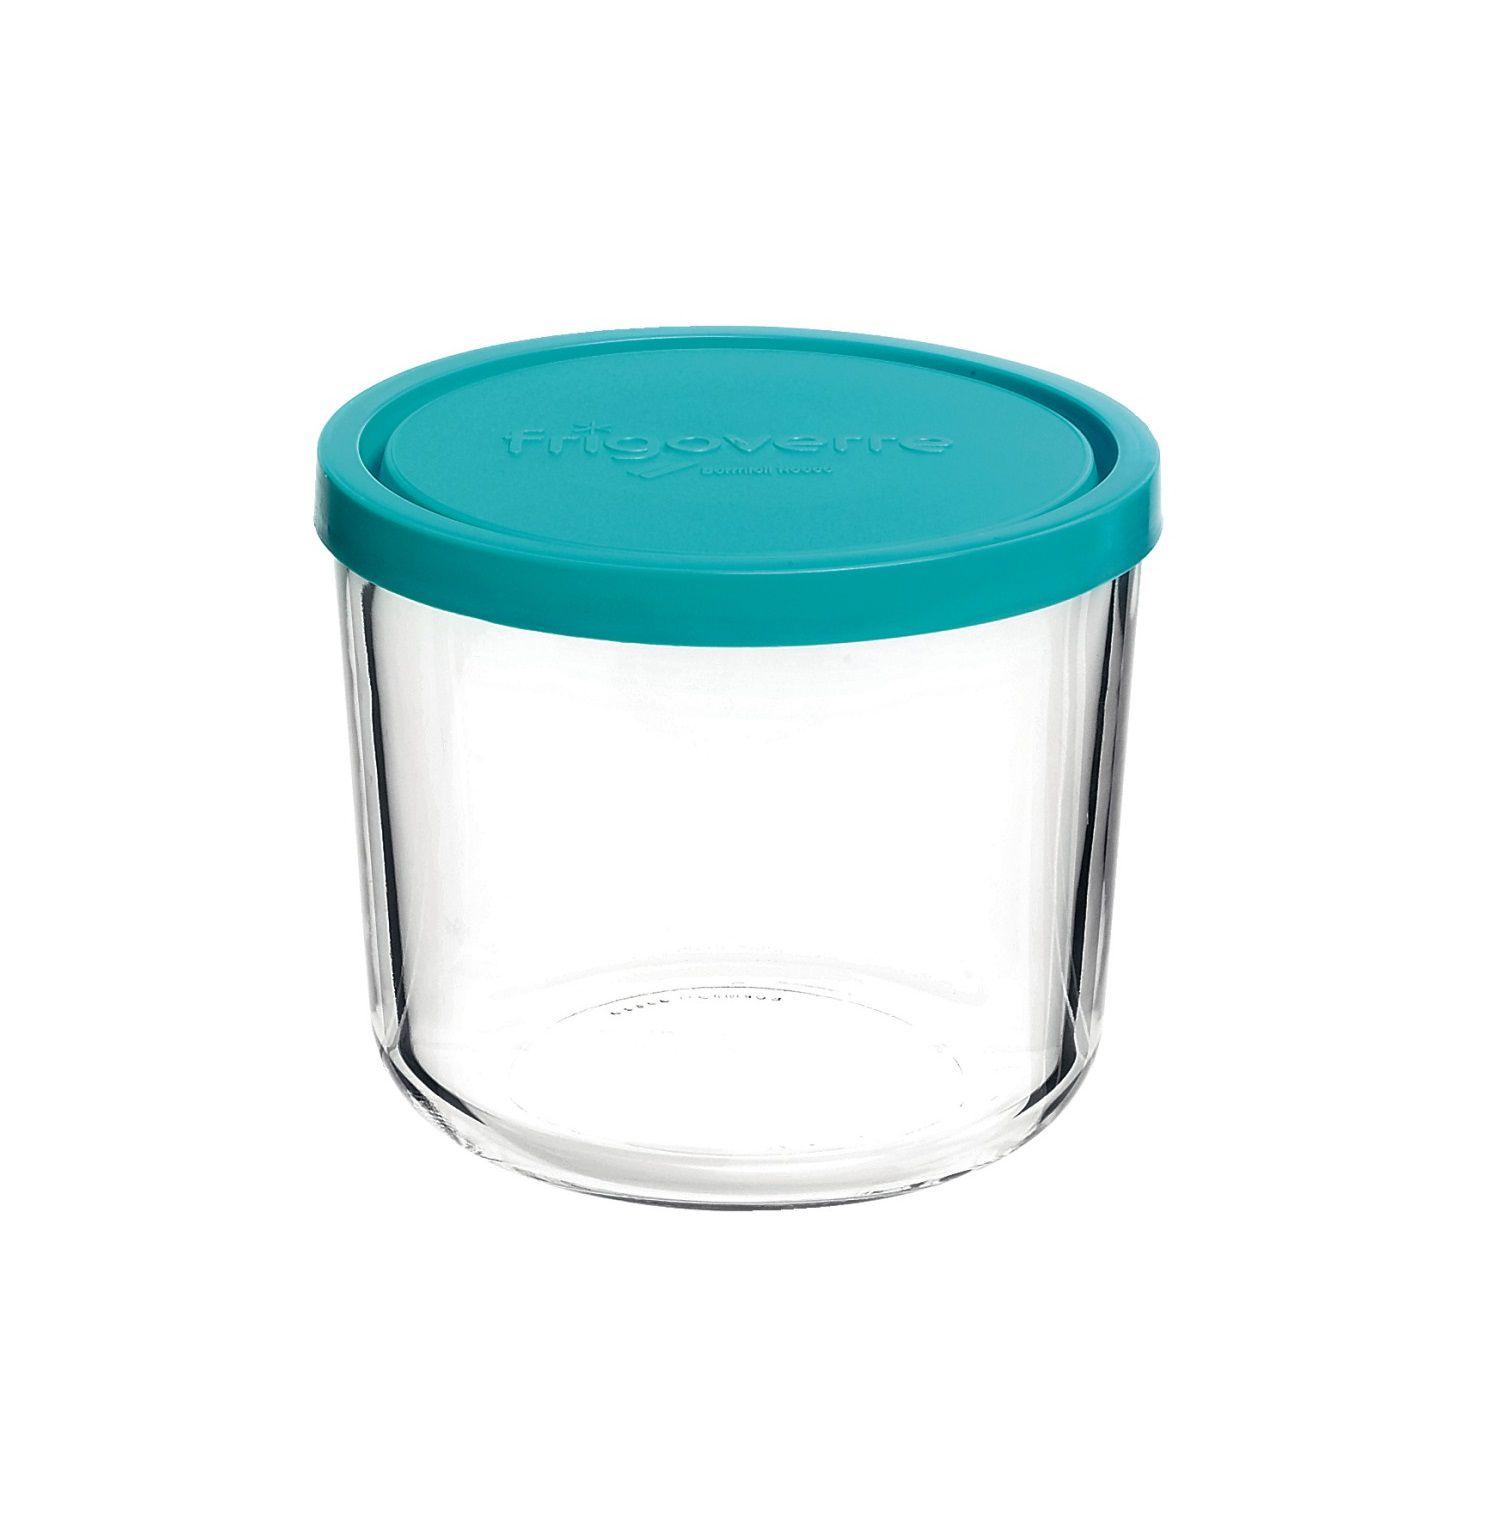 Bormioli vershoudbakje Frigoverre blauw Ø 12 cm